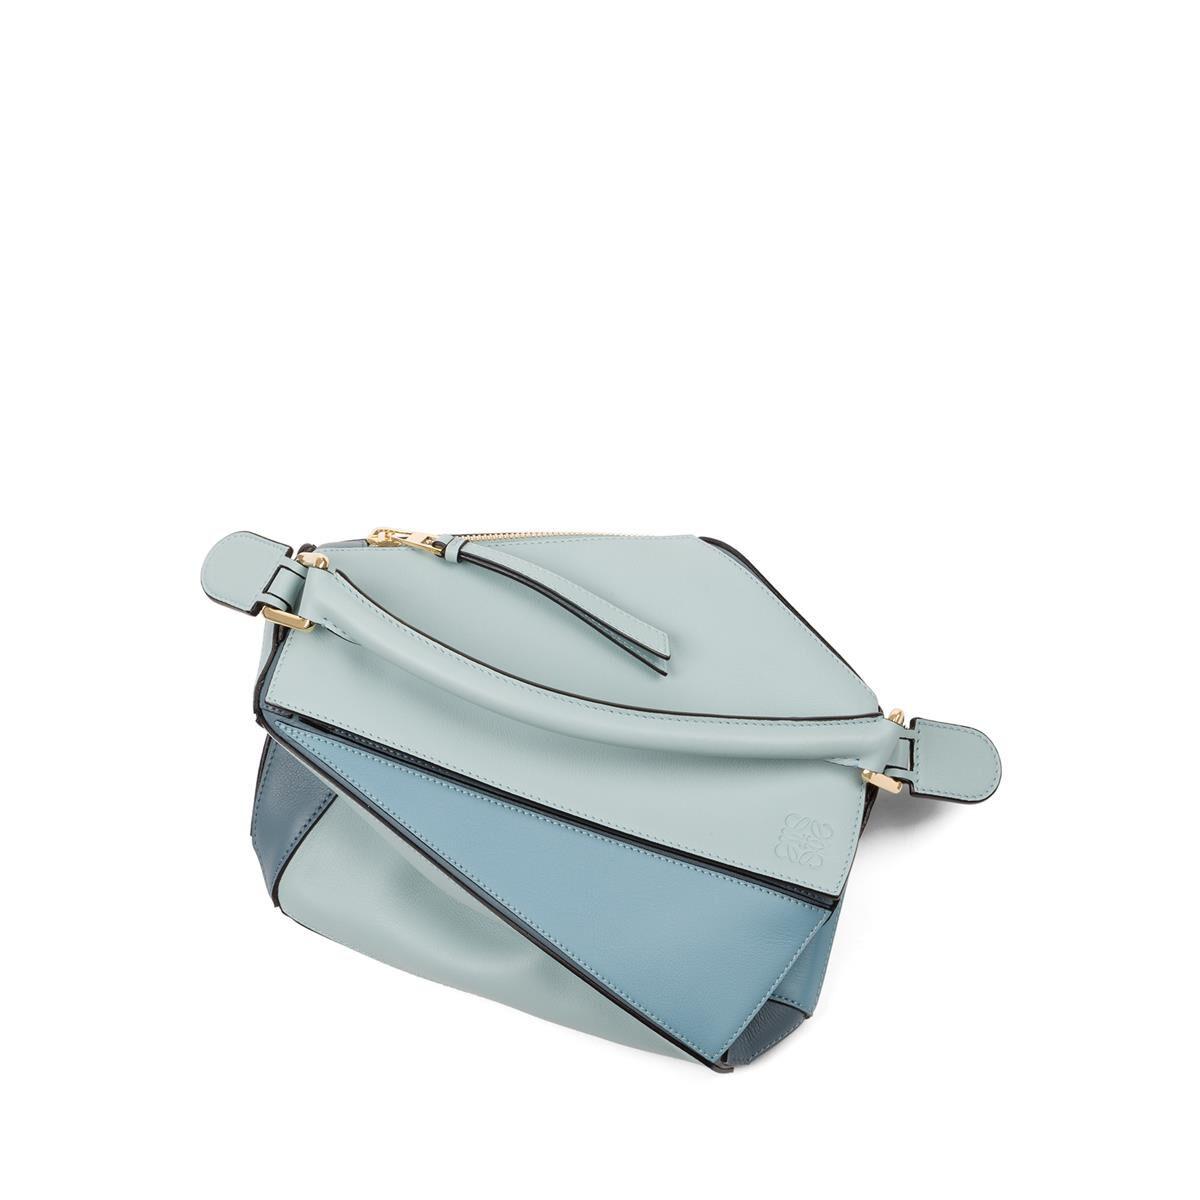 LOEWE Puzzle Small Bag アクア/ライトブルー/ストーンブルー all